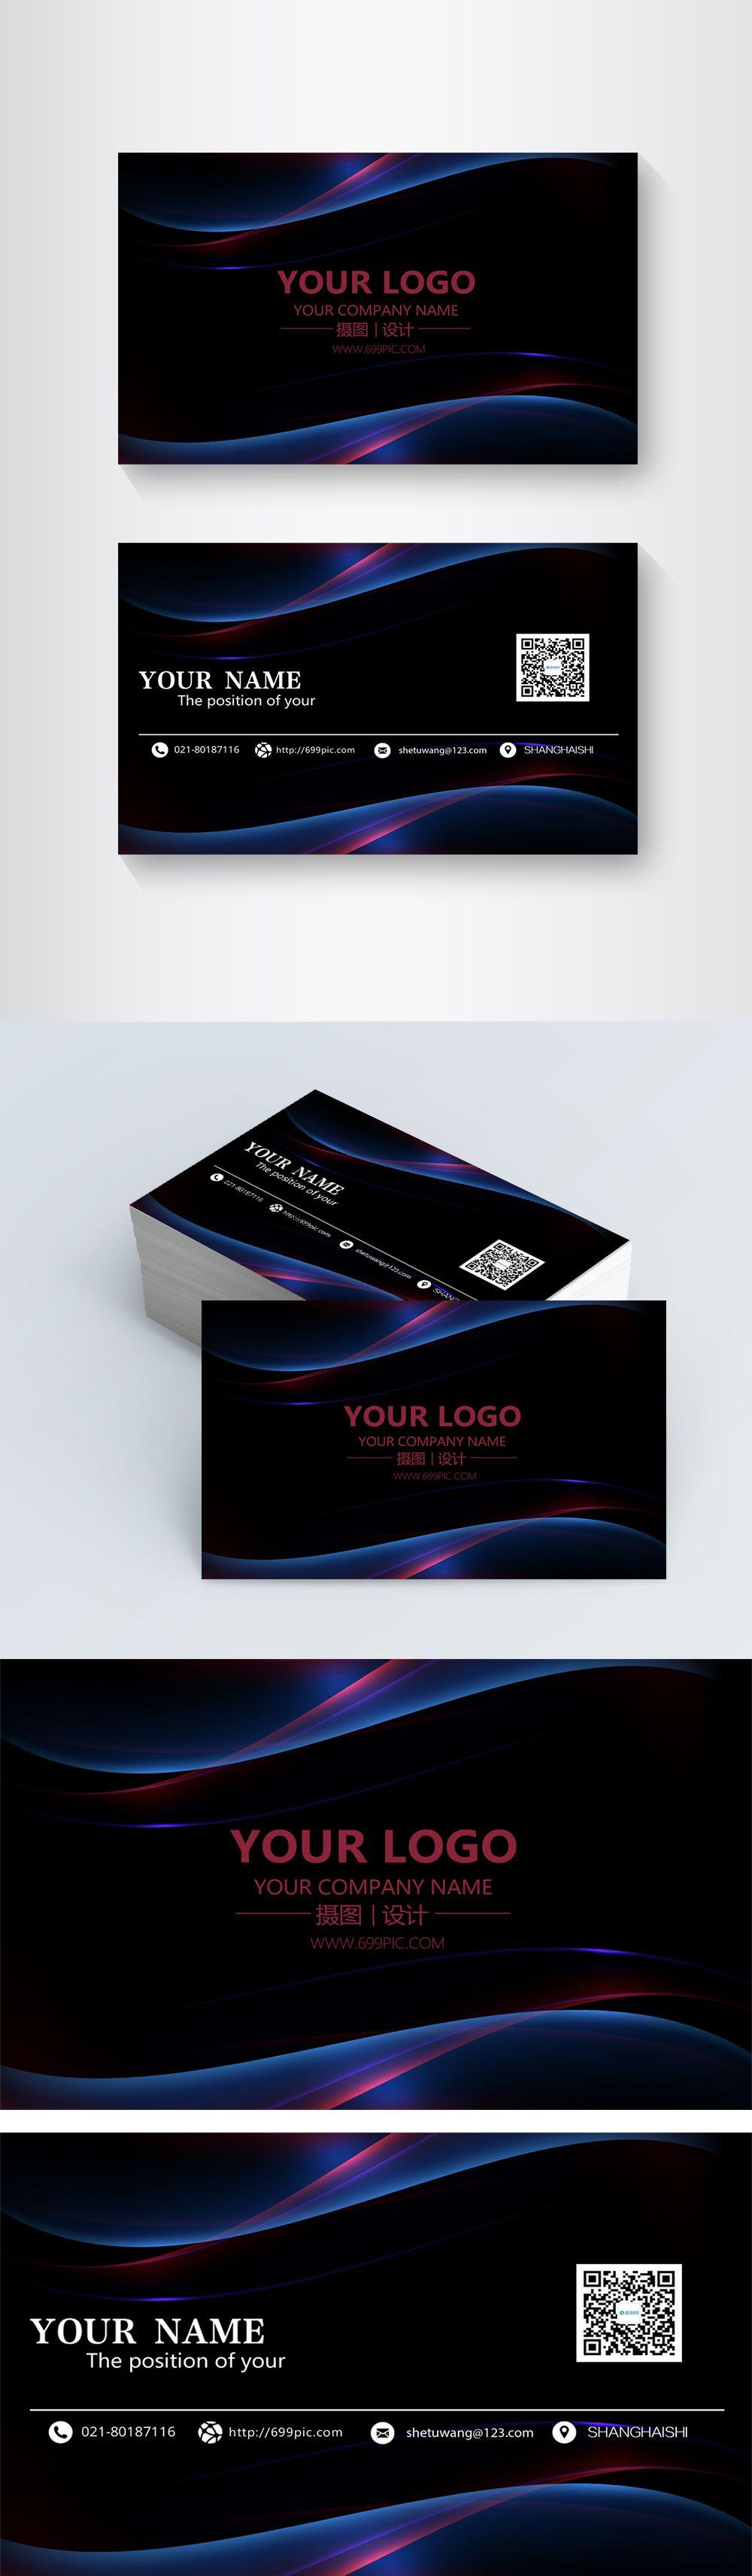 Business Card Design Of Dazzle Color Gradient Line Business